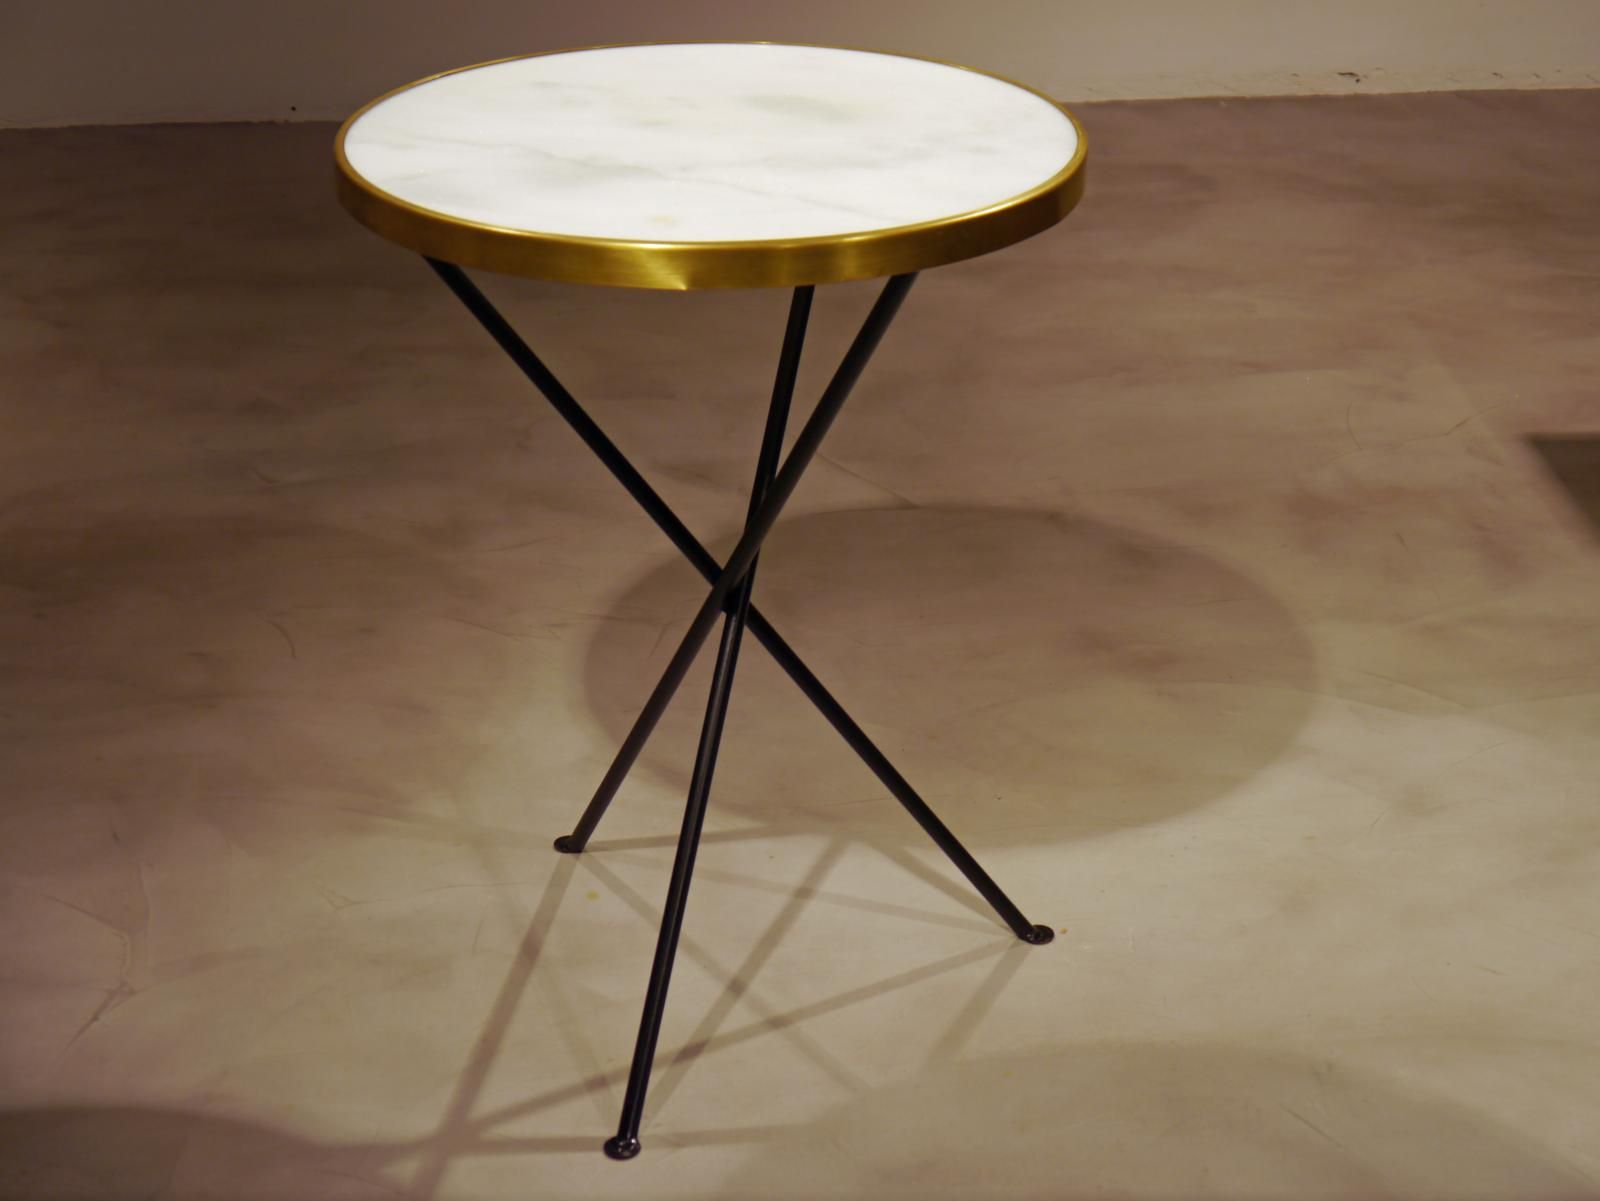 Mesas de latón | Archiproducts